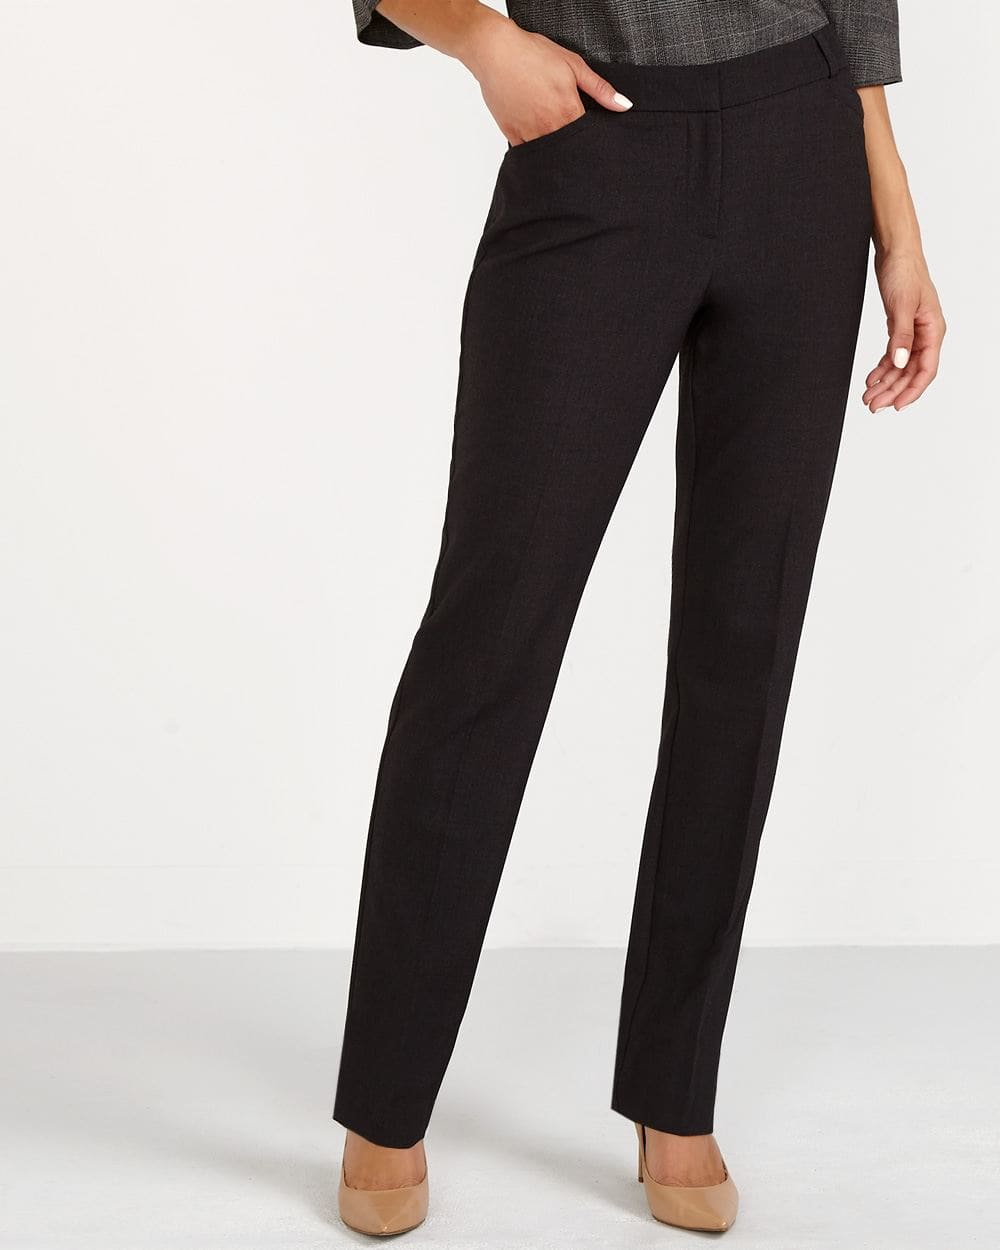 The New Classic Straight Leg Pants